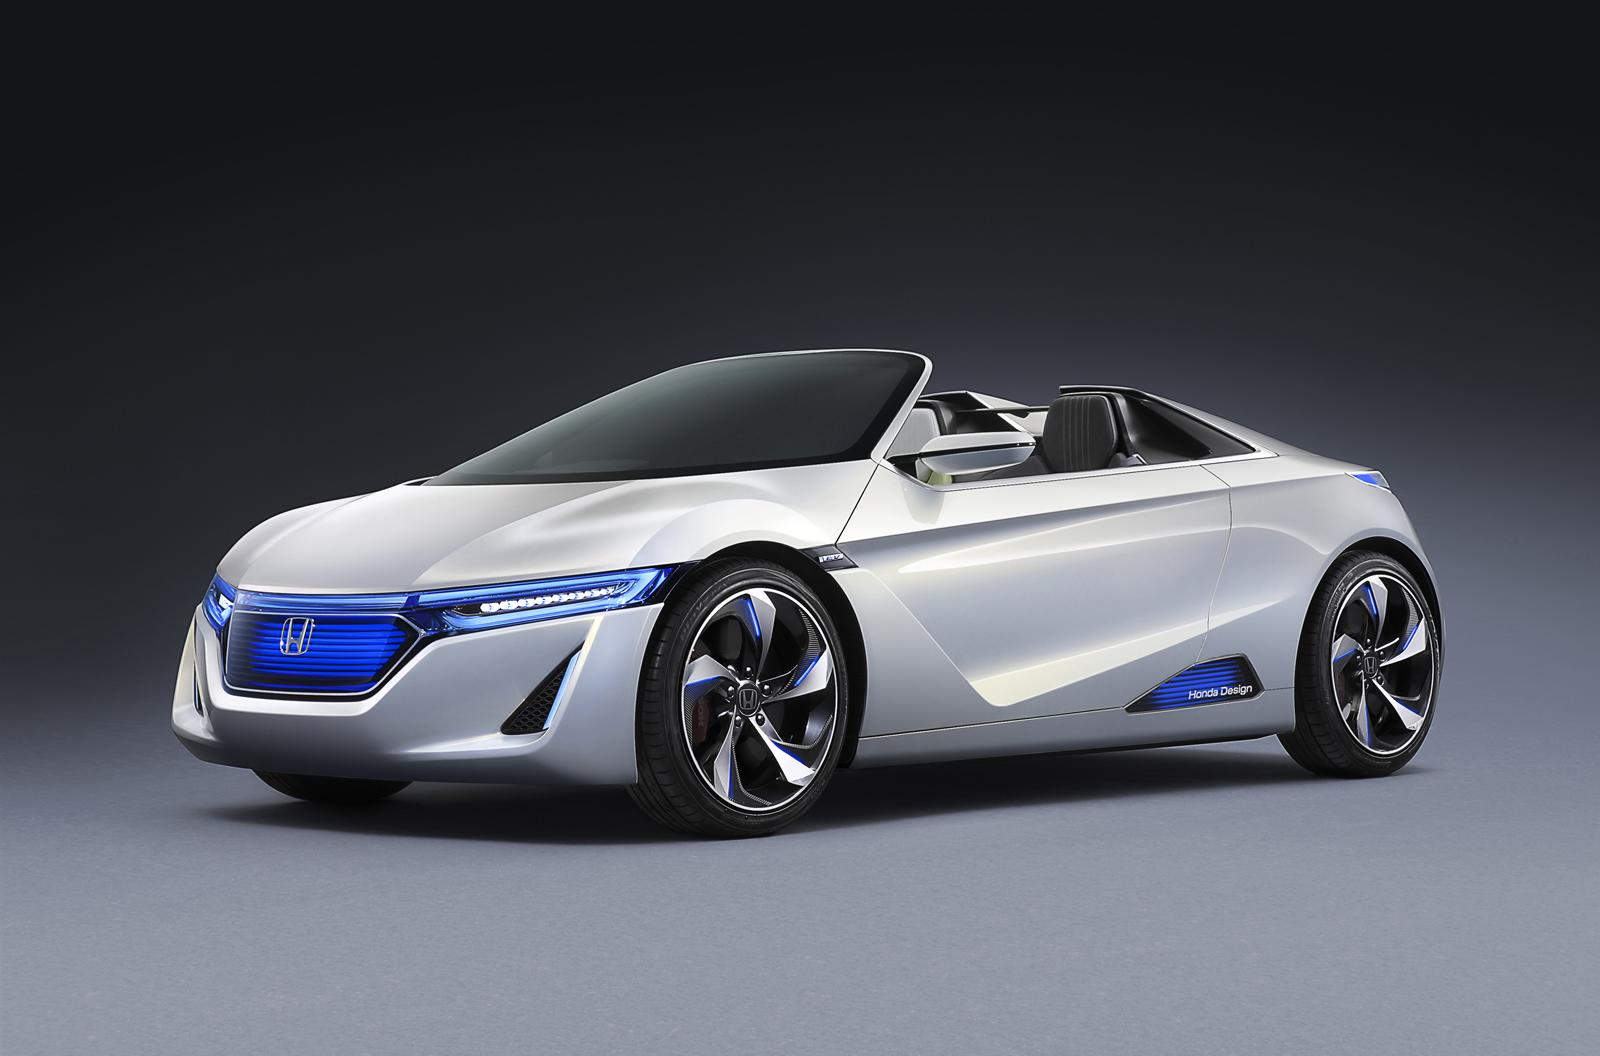 Honda Ev Ster Small Sports Concept Unveiled